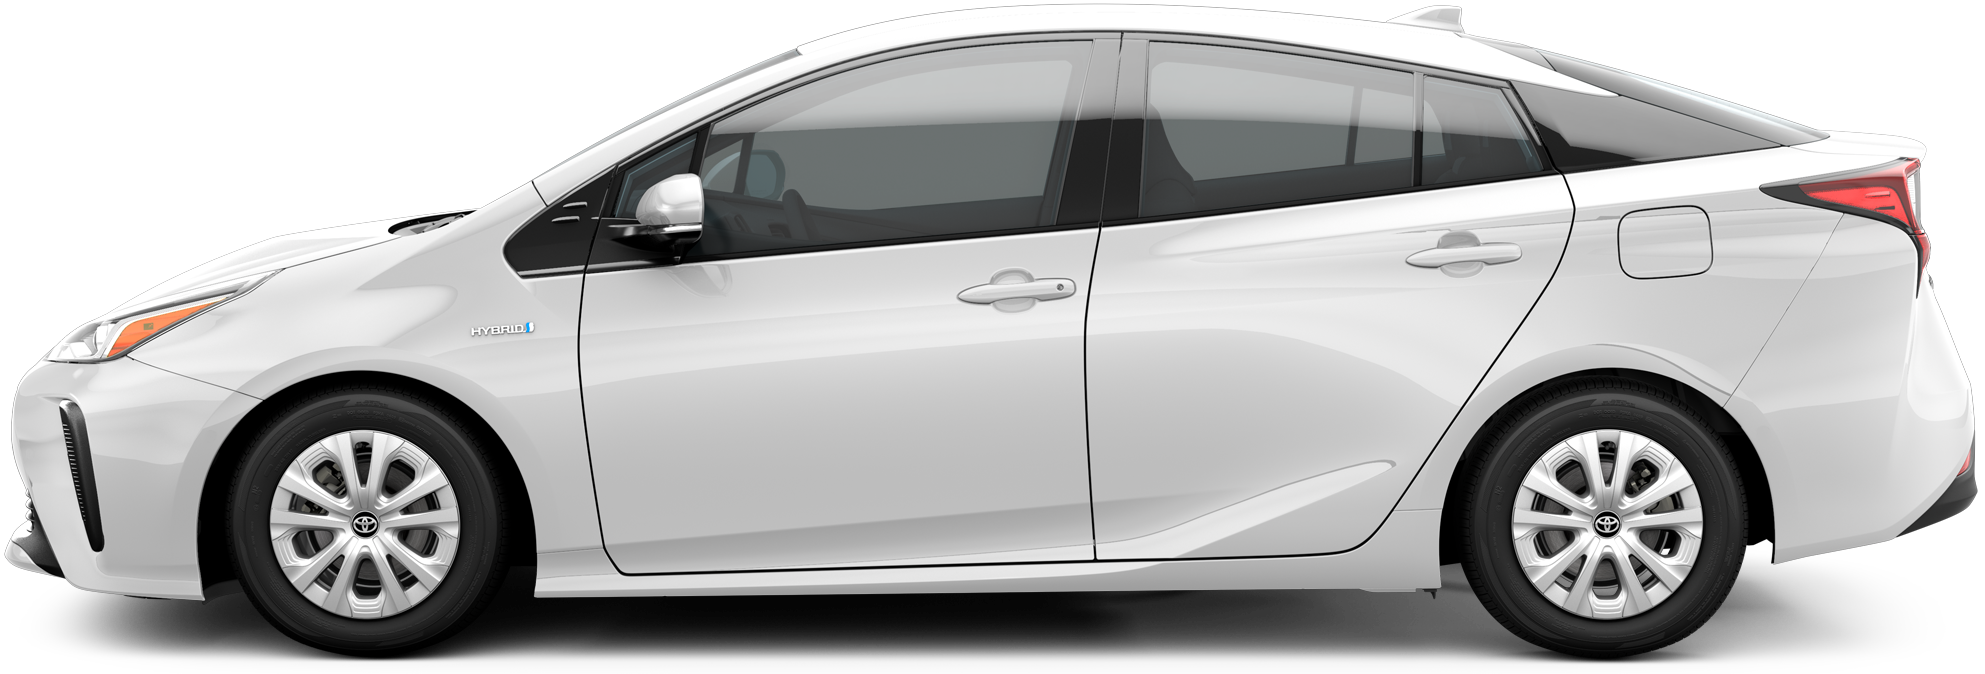 2022 Toyota Prius Hatchback L